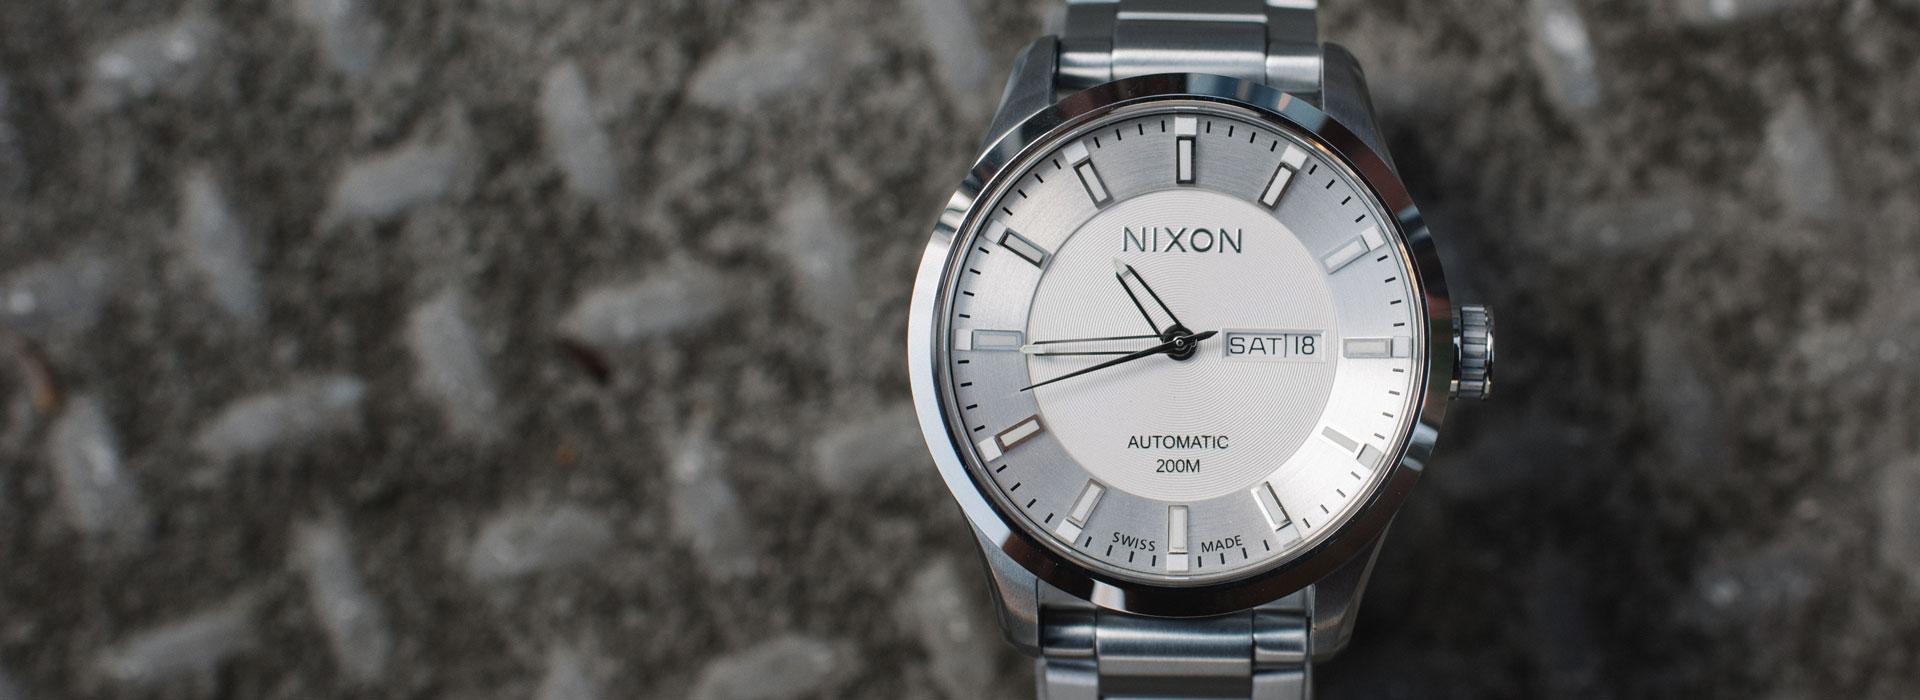 nixon automatic II sale 70% off